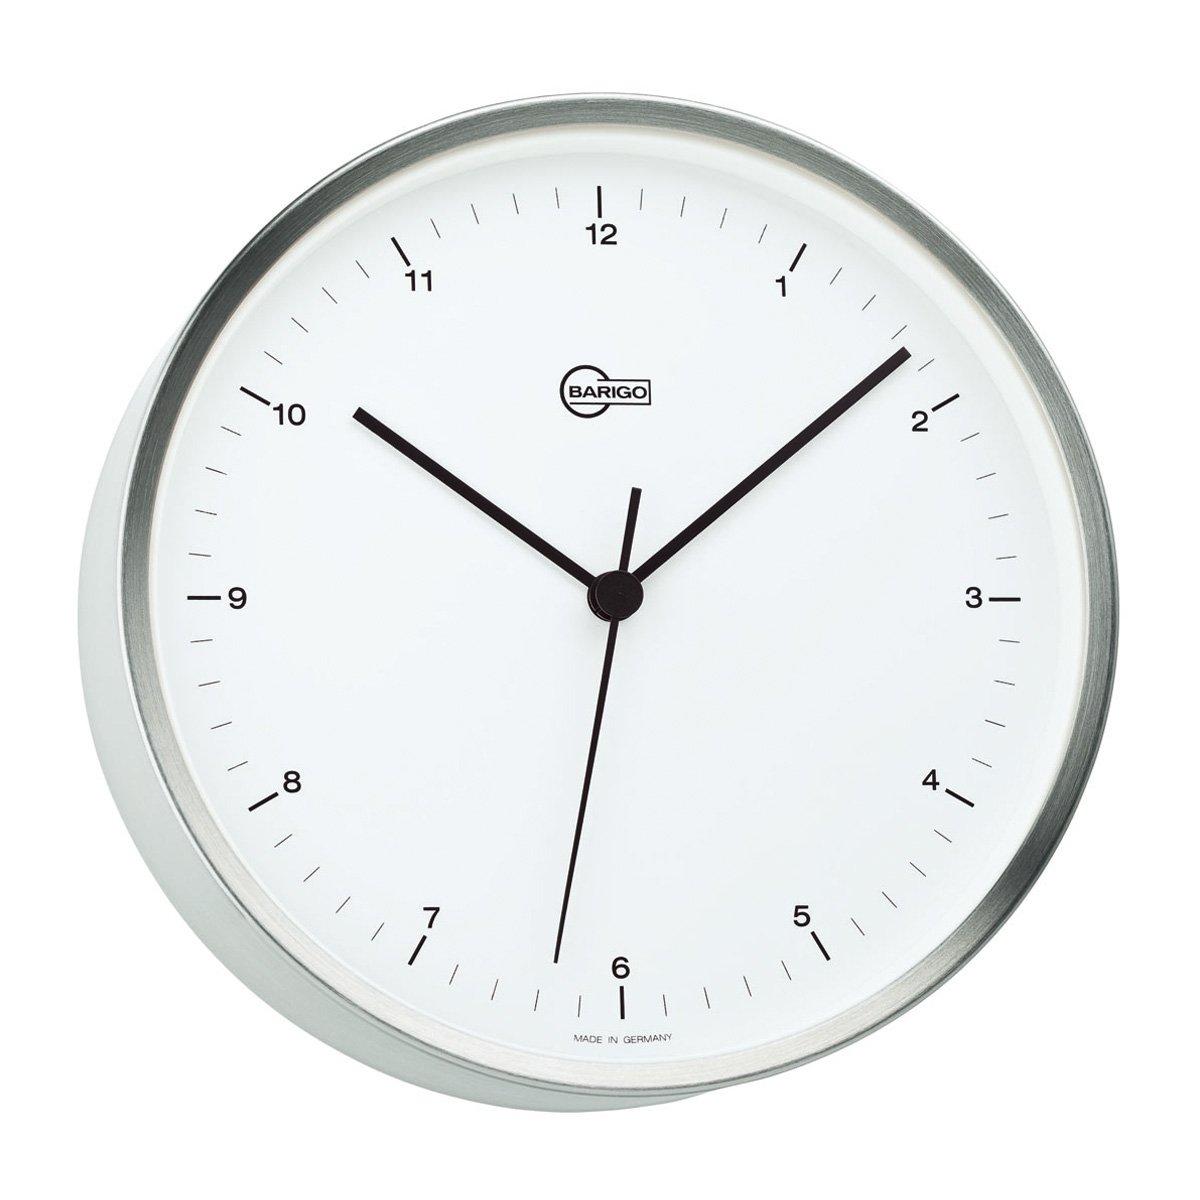 Barigo Ships Clock brushed stainless steel